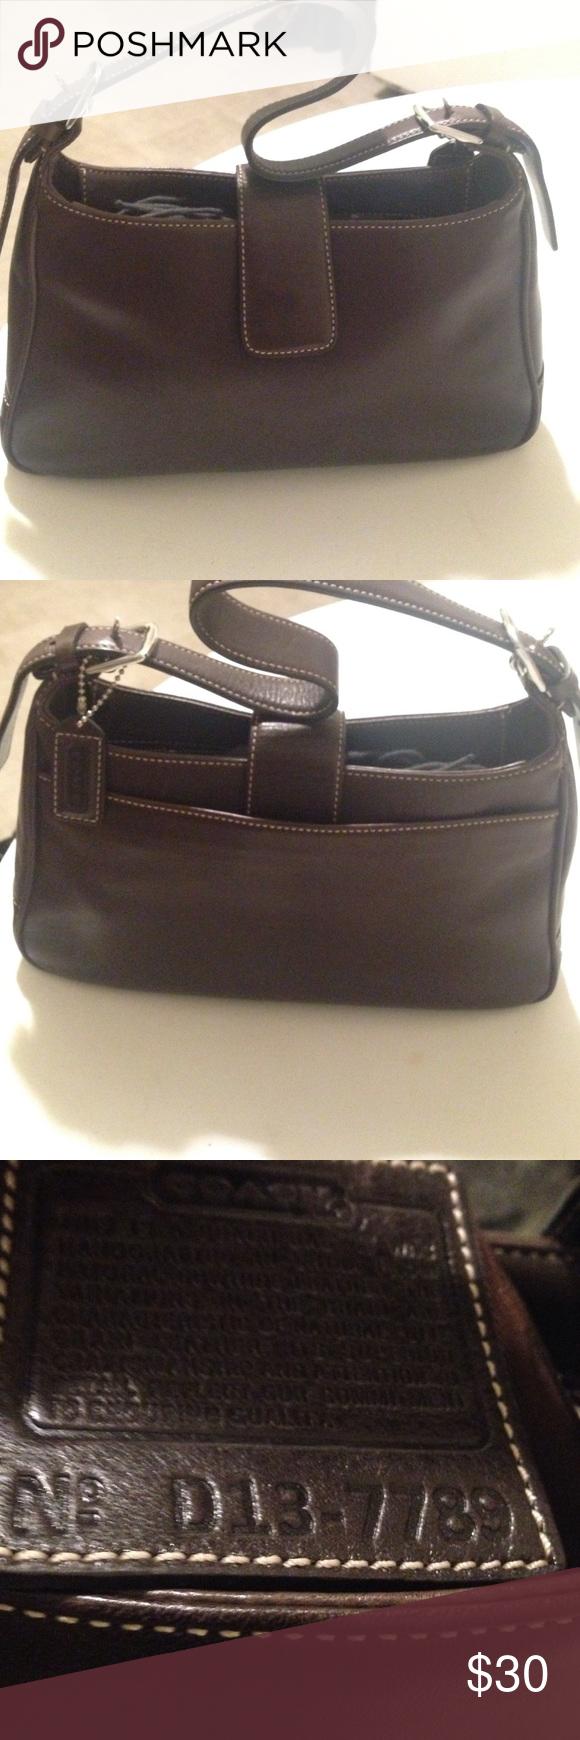 Image Led Clean A Leather Purse 1